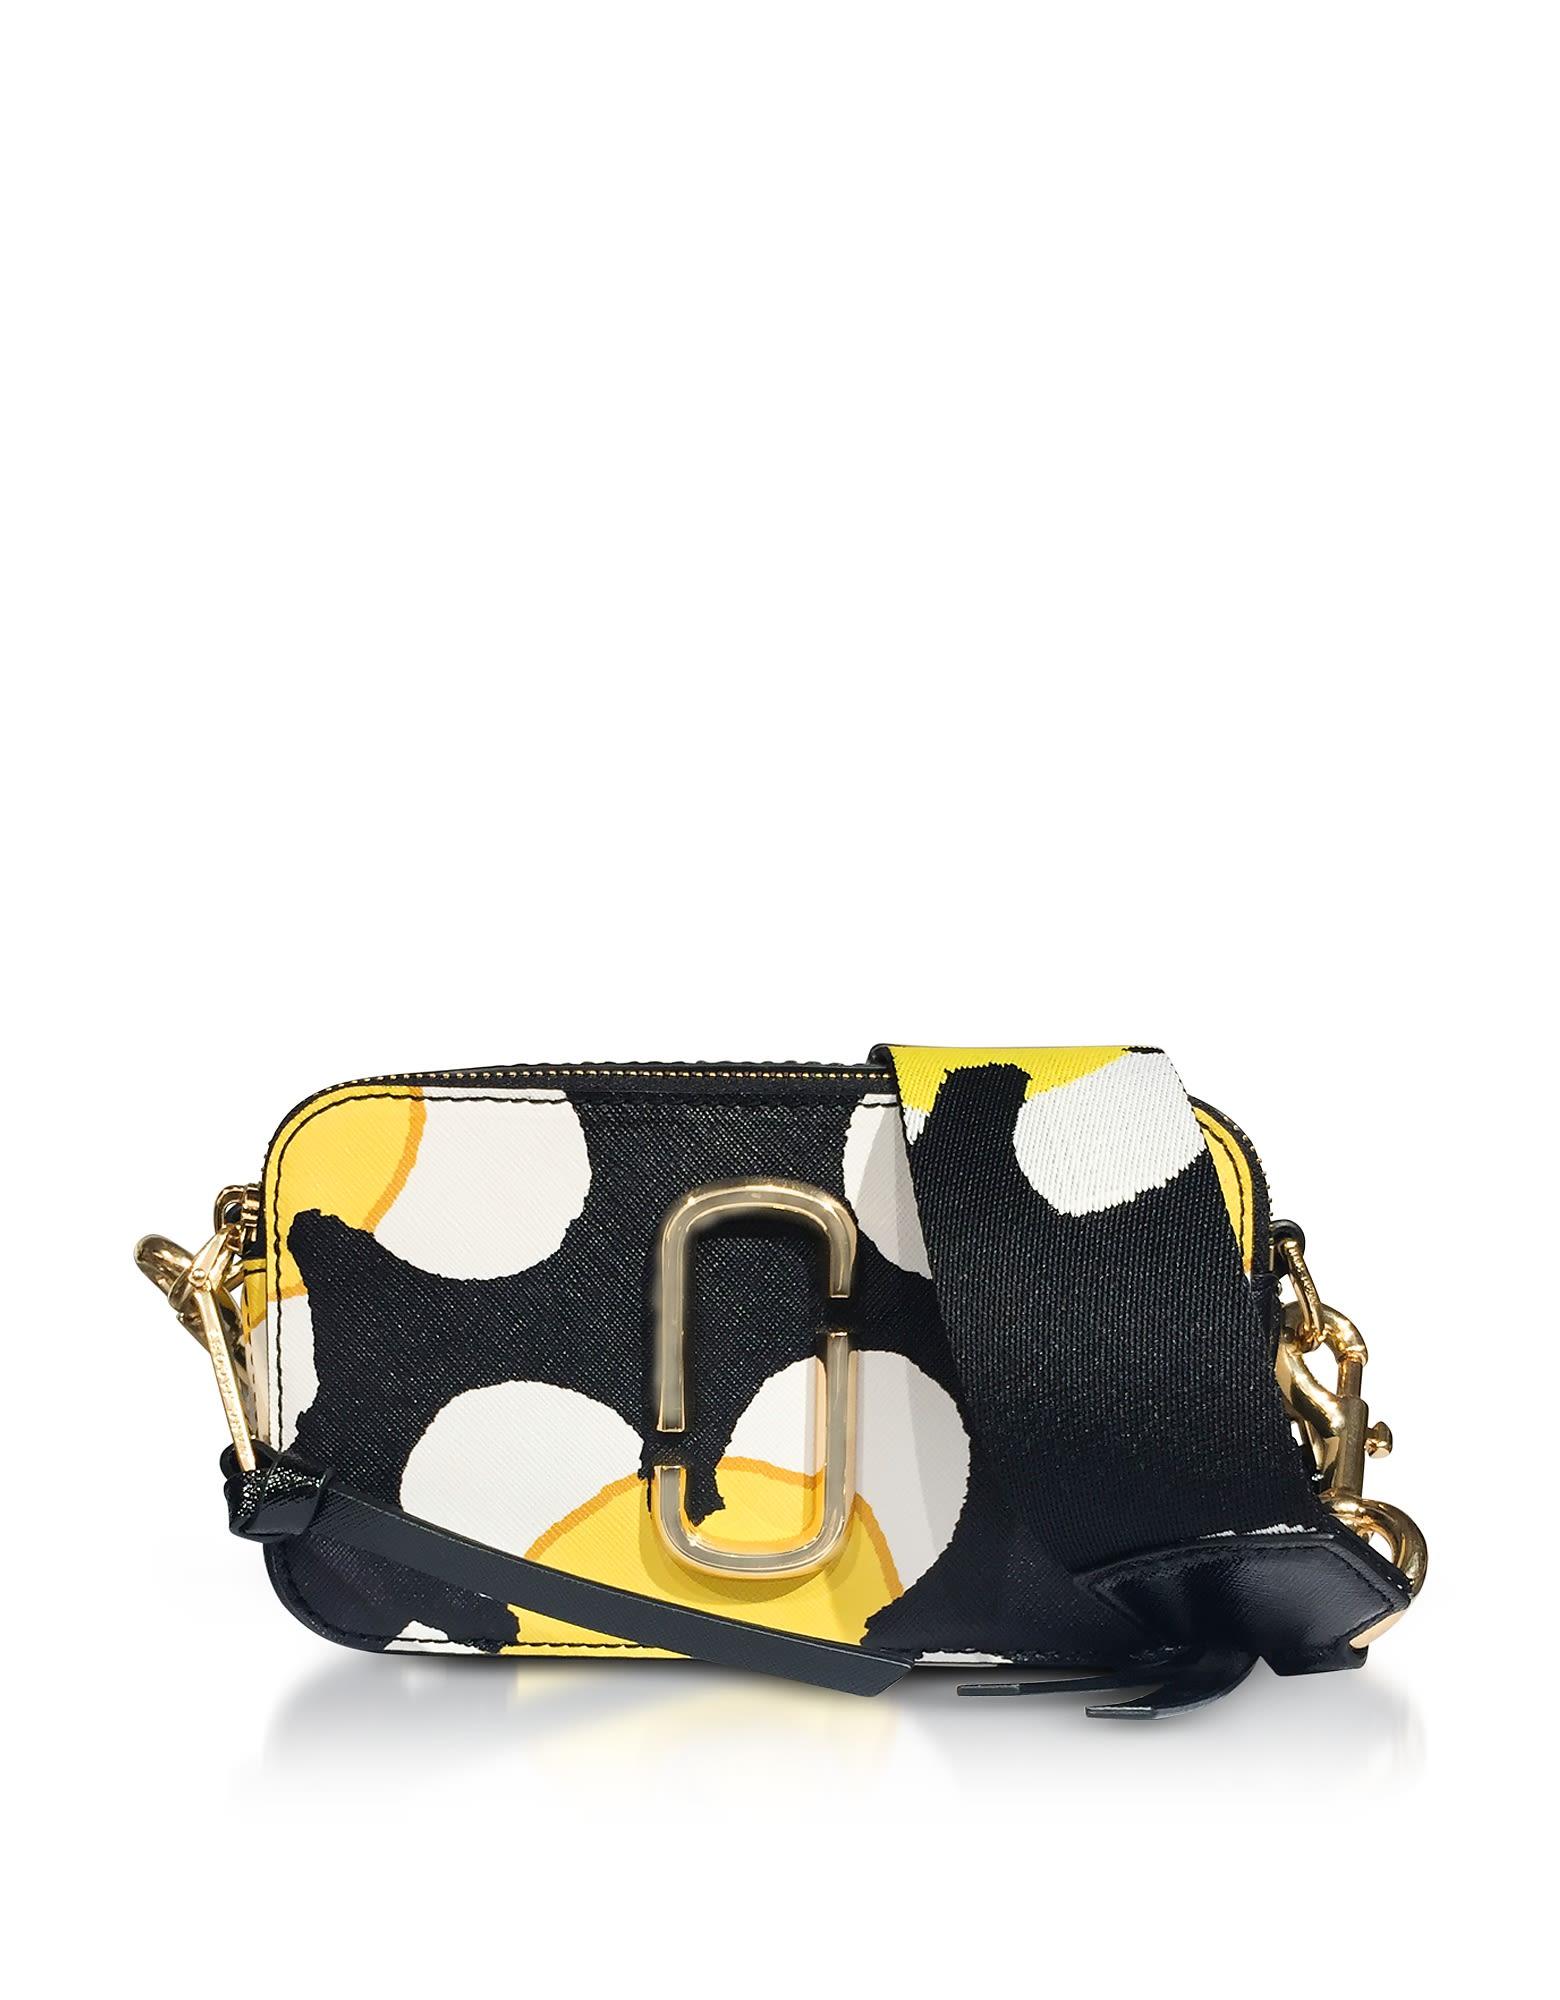 Bolso Block Daisy en negro Multi cámara Yellow Snapshot Jacobs para Marc Color 6w7rR6q